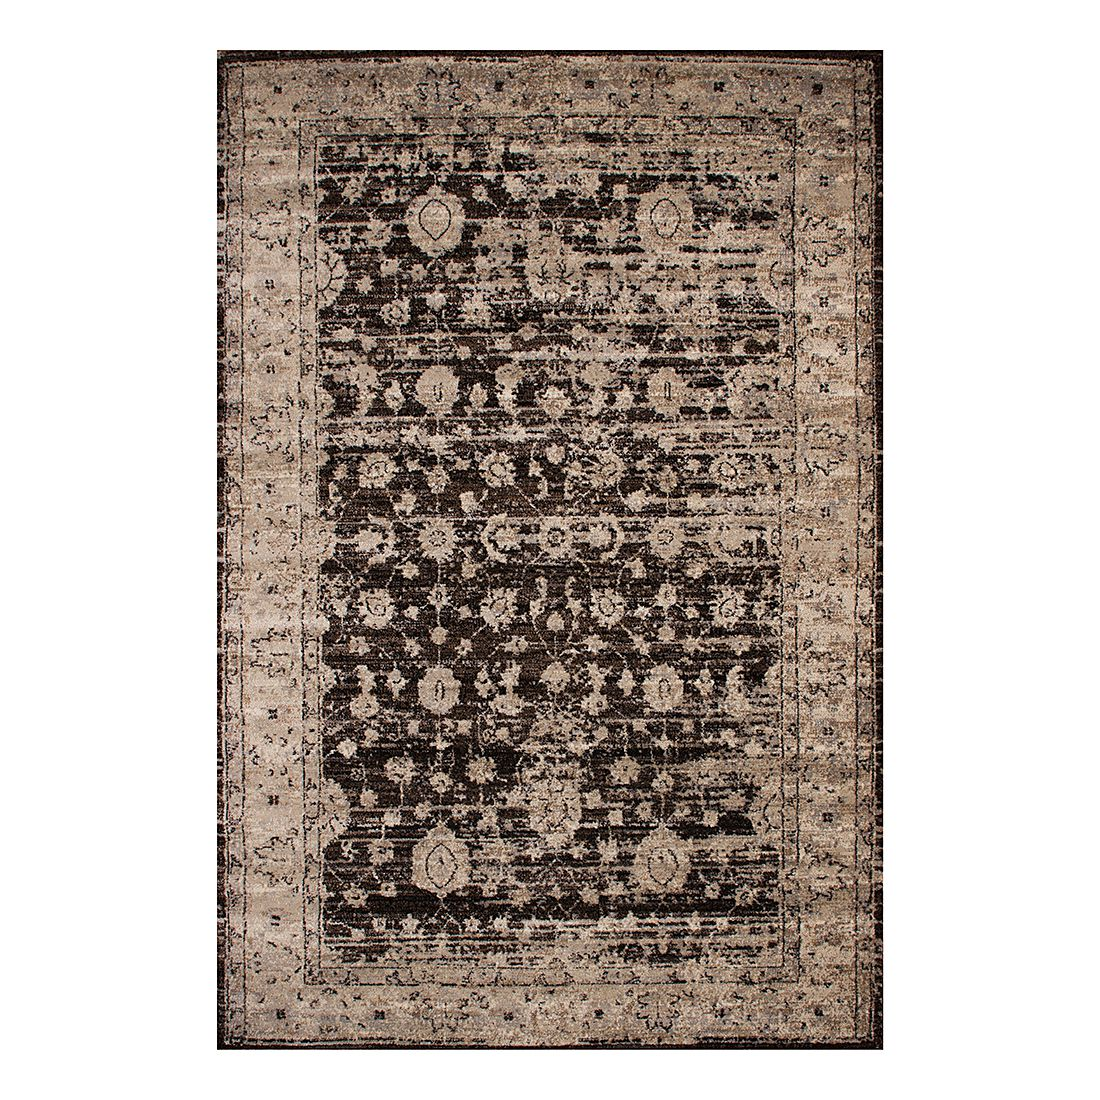 Teppich Bruges – Beige – 200 x 290 cm, Kayoom günstig